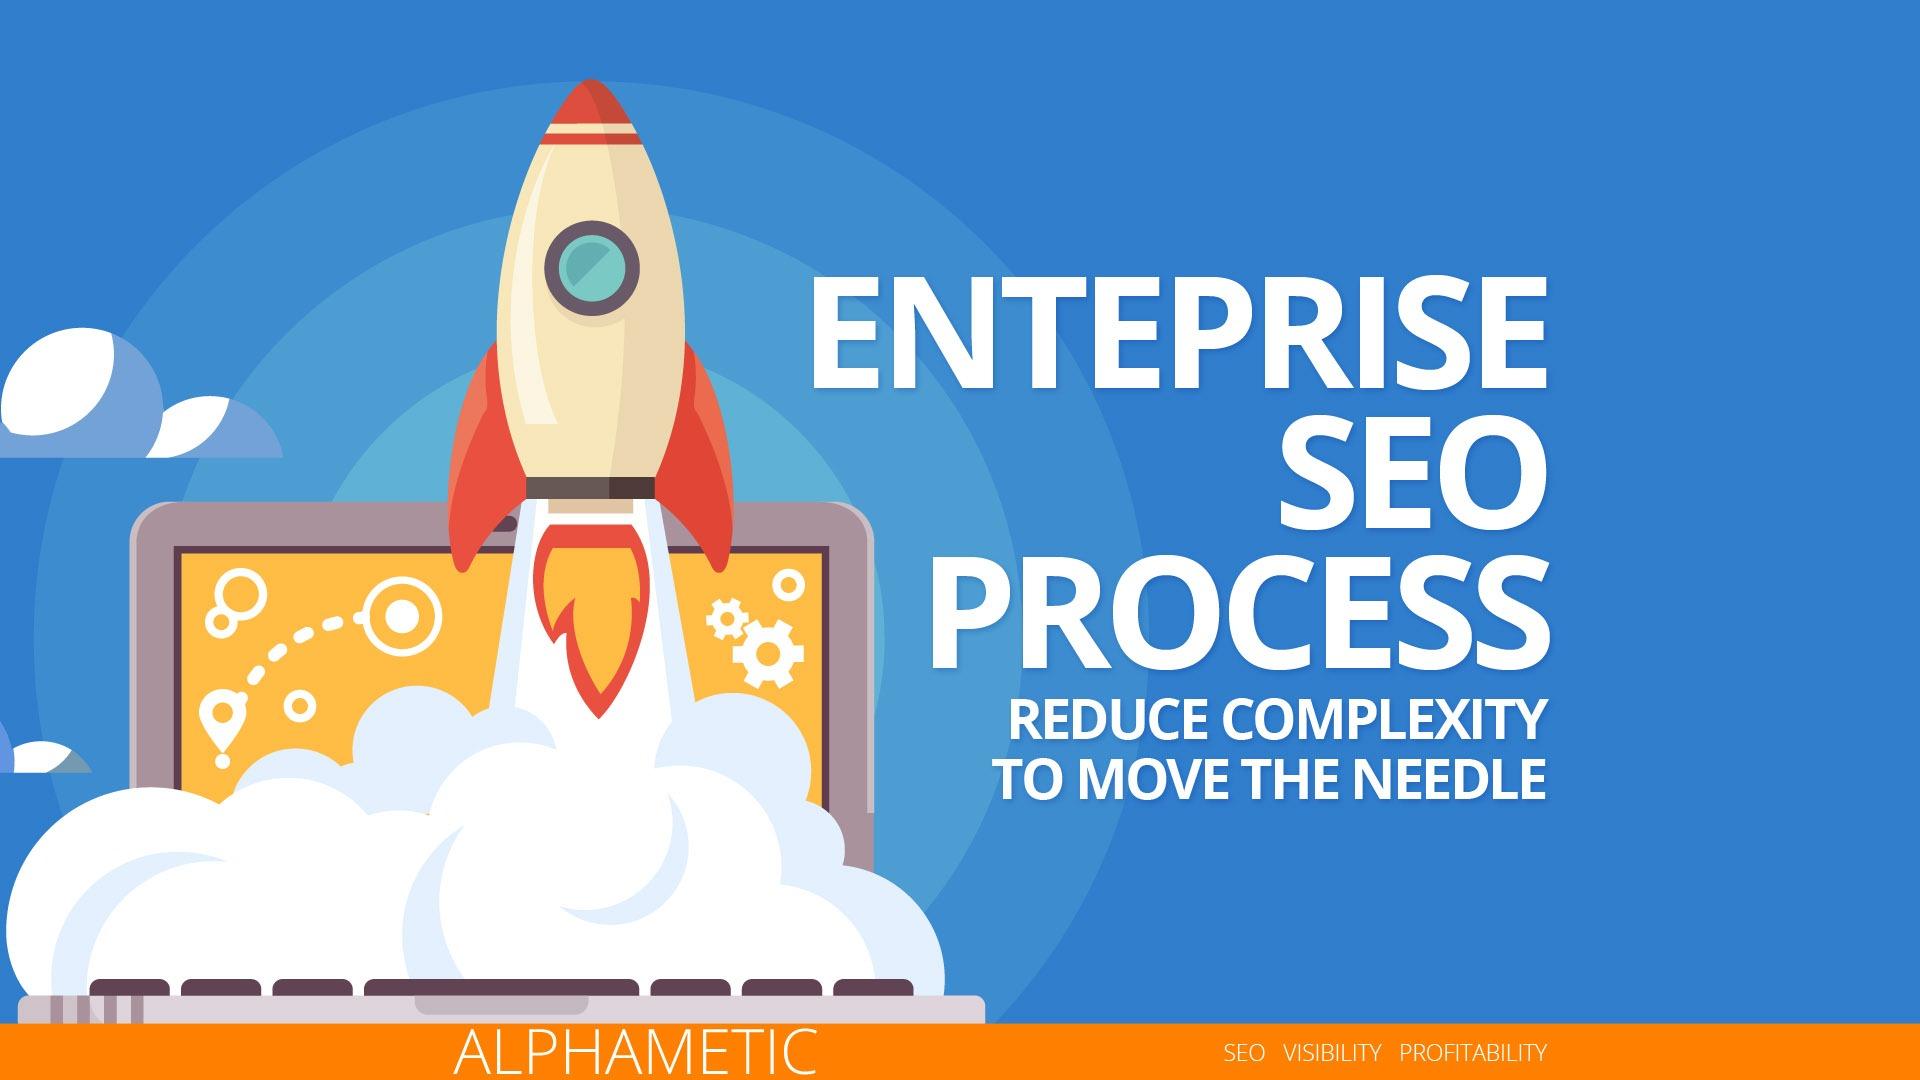 Enterprise SEO Process & Strategy | Alphametic